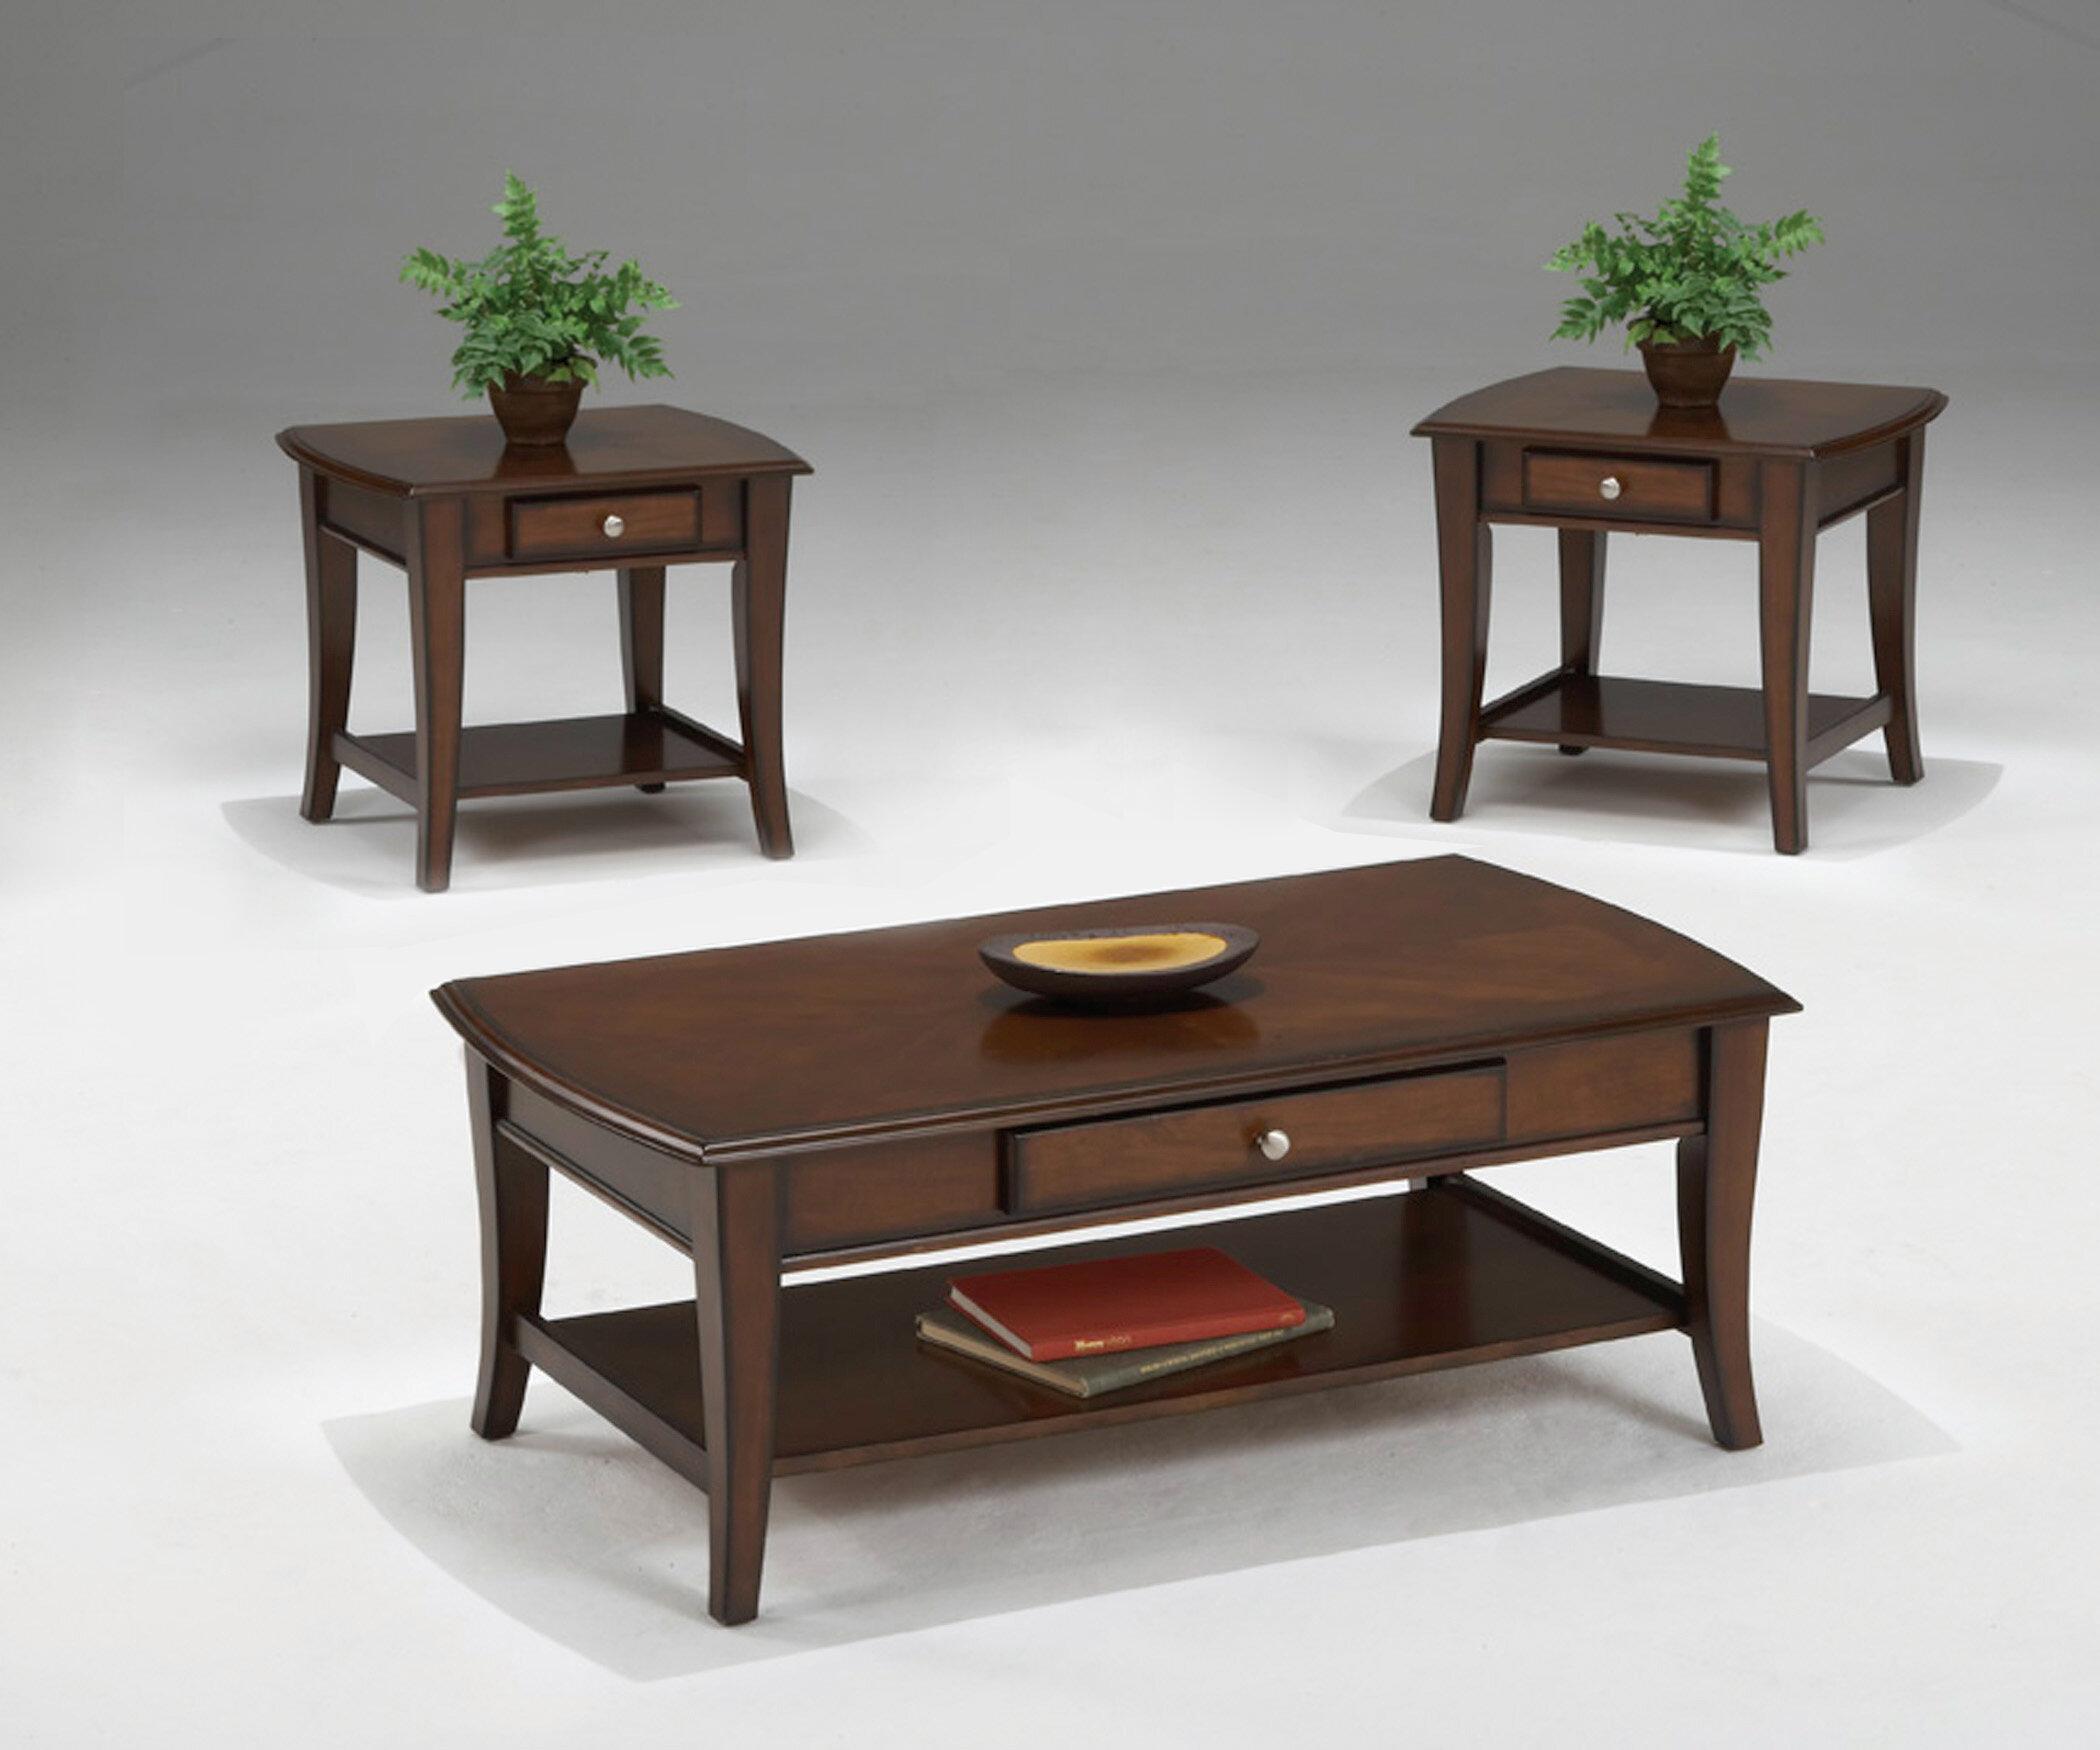 Bernards Broadway 3 Piece Coffee Table Set & Reviews